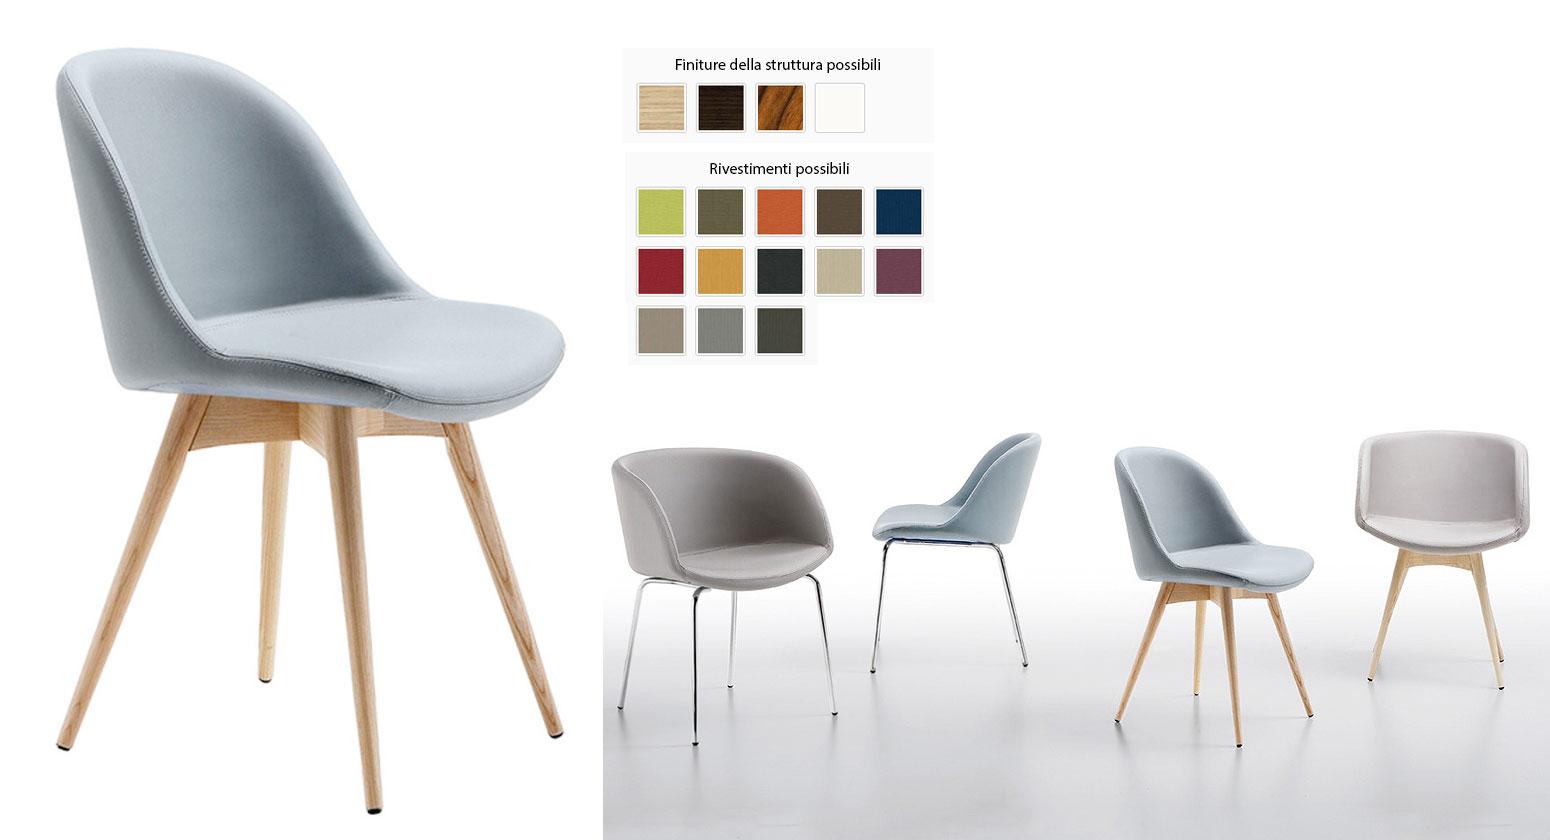 Sedie moderne: Sedia modello Sonny